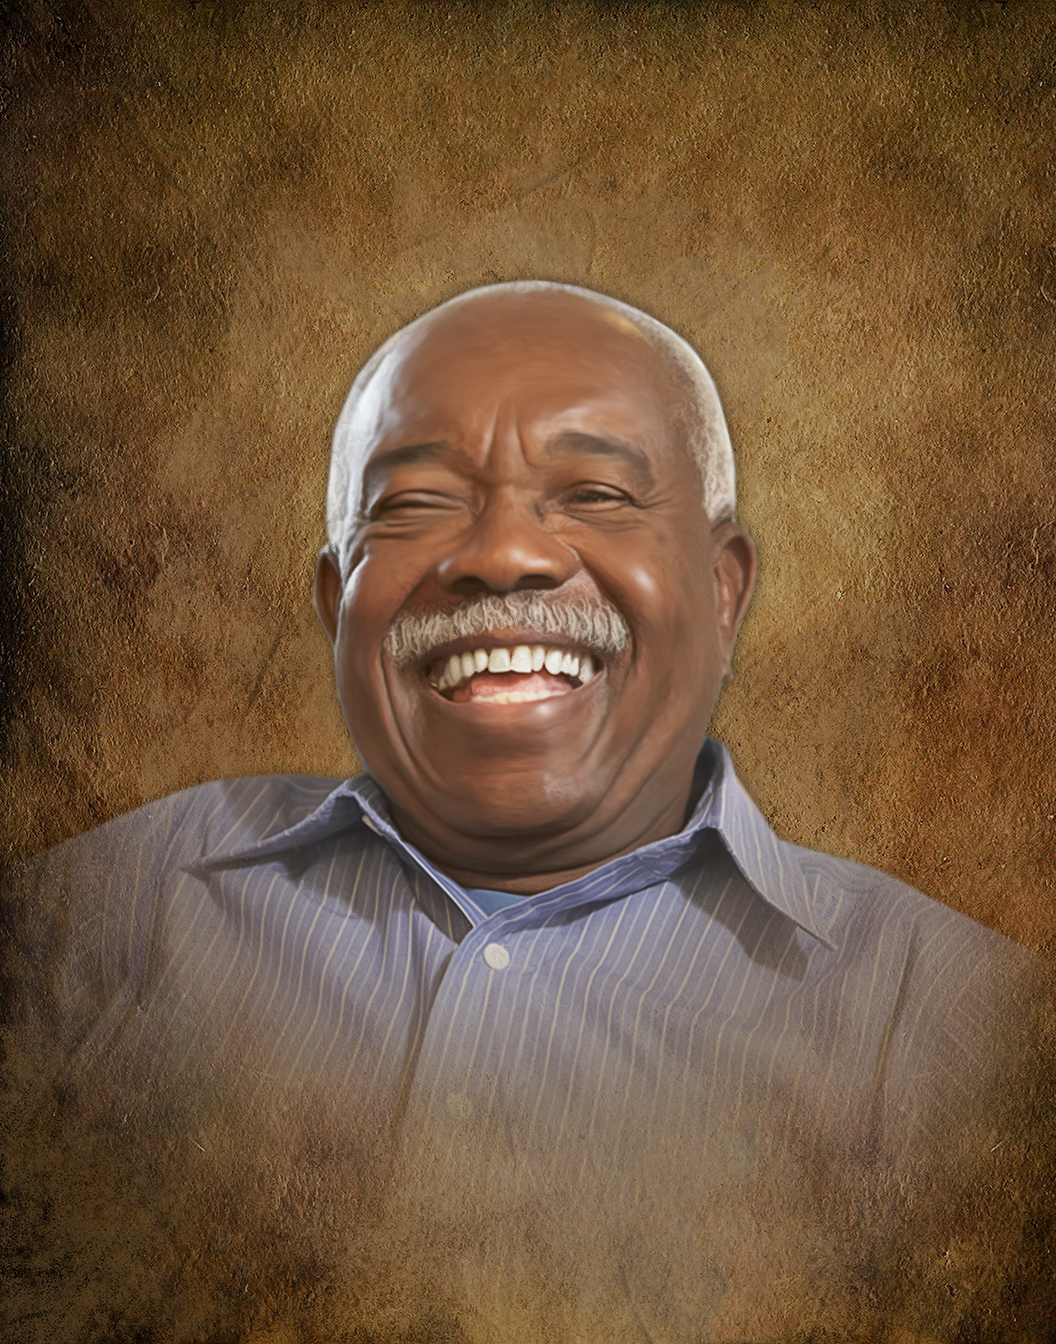 Memorial Portraits | Memory Portraits | Smiling Black Man